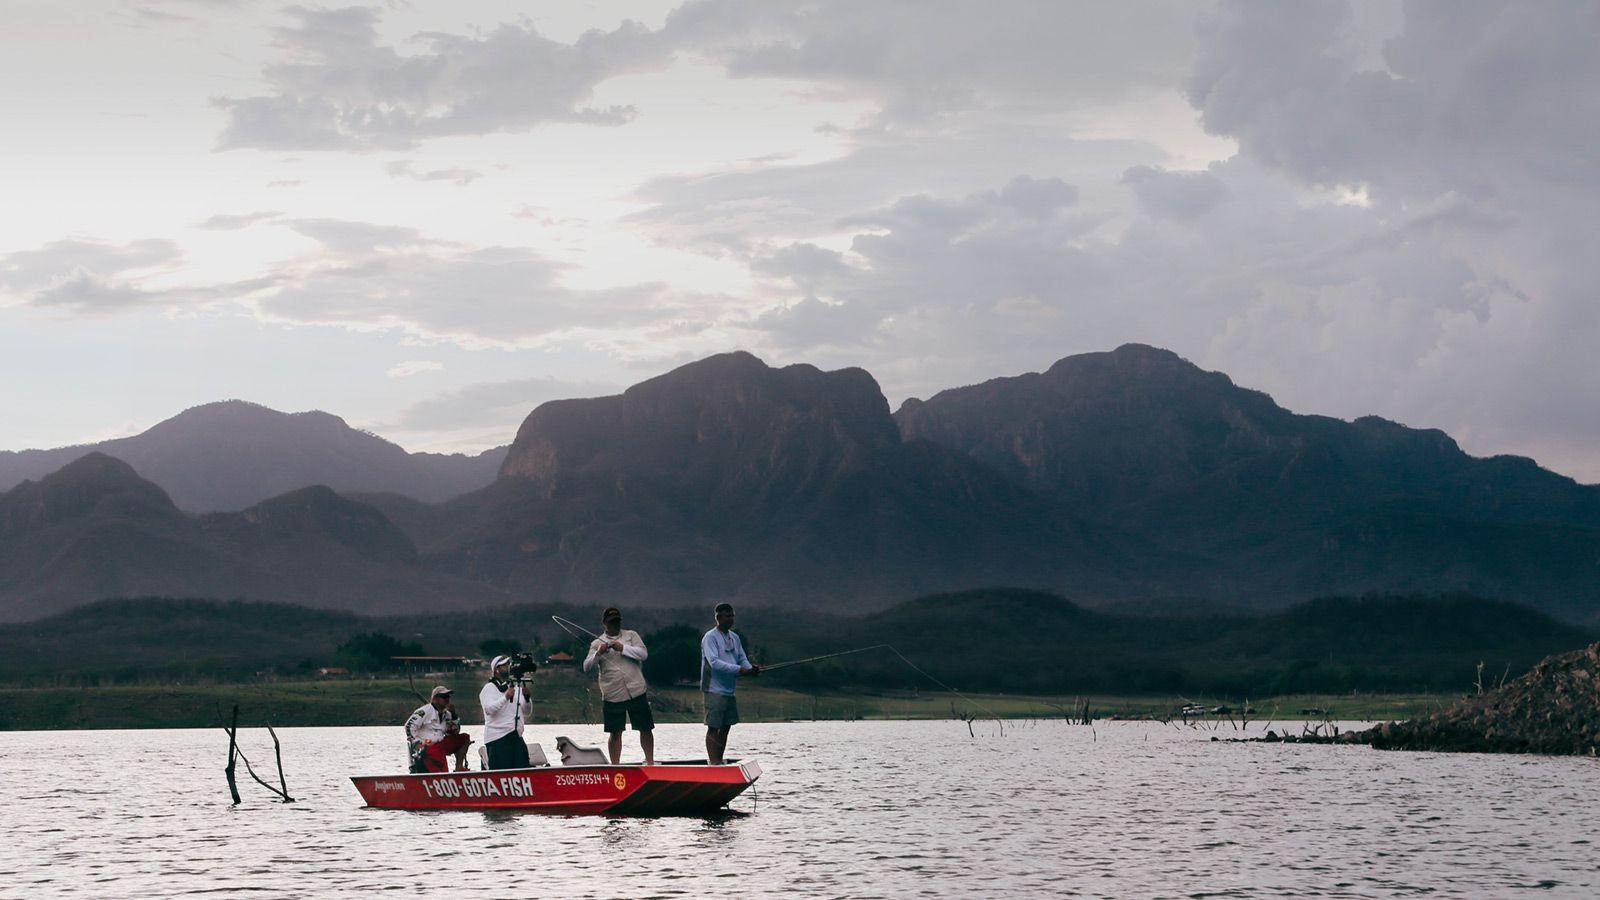 bass-fishing-show-gear-patrol-lead-hero